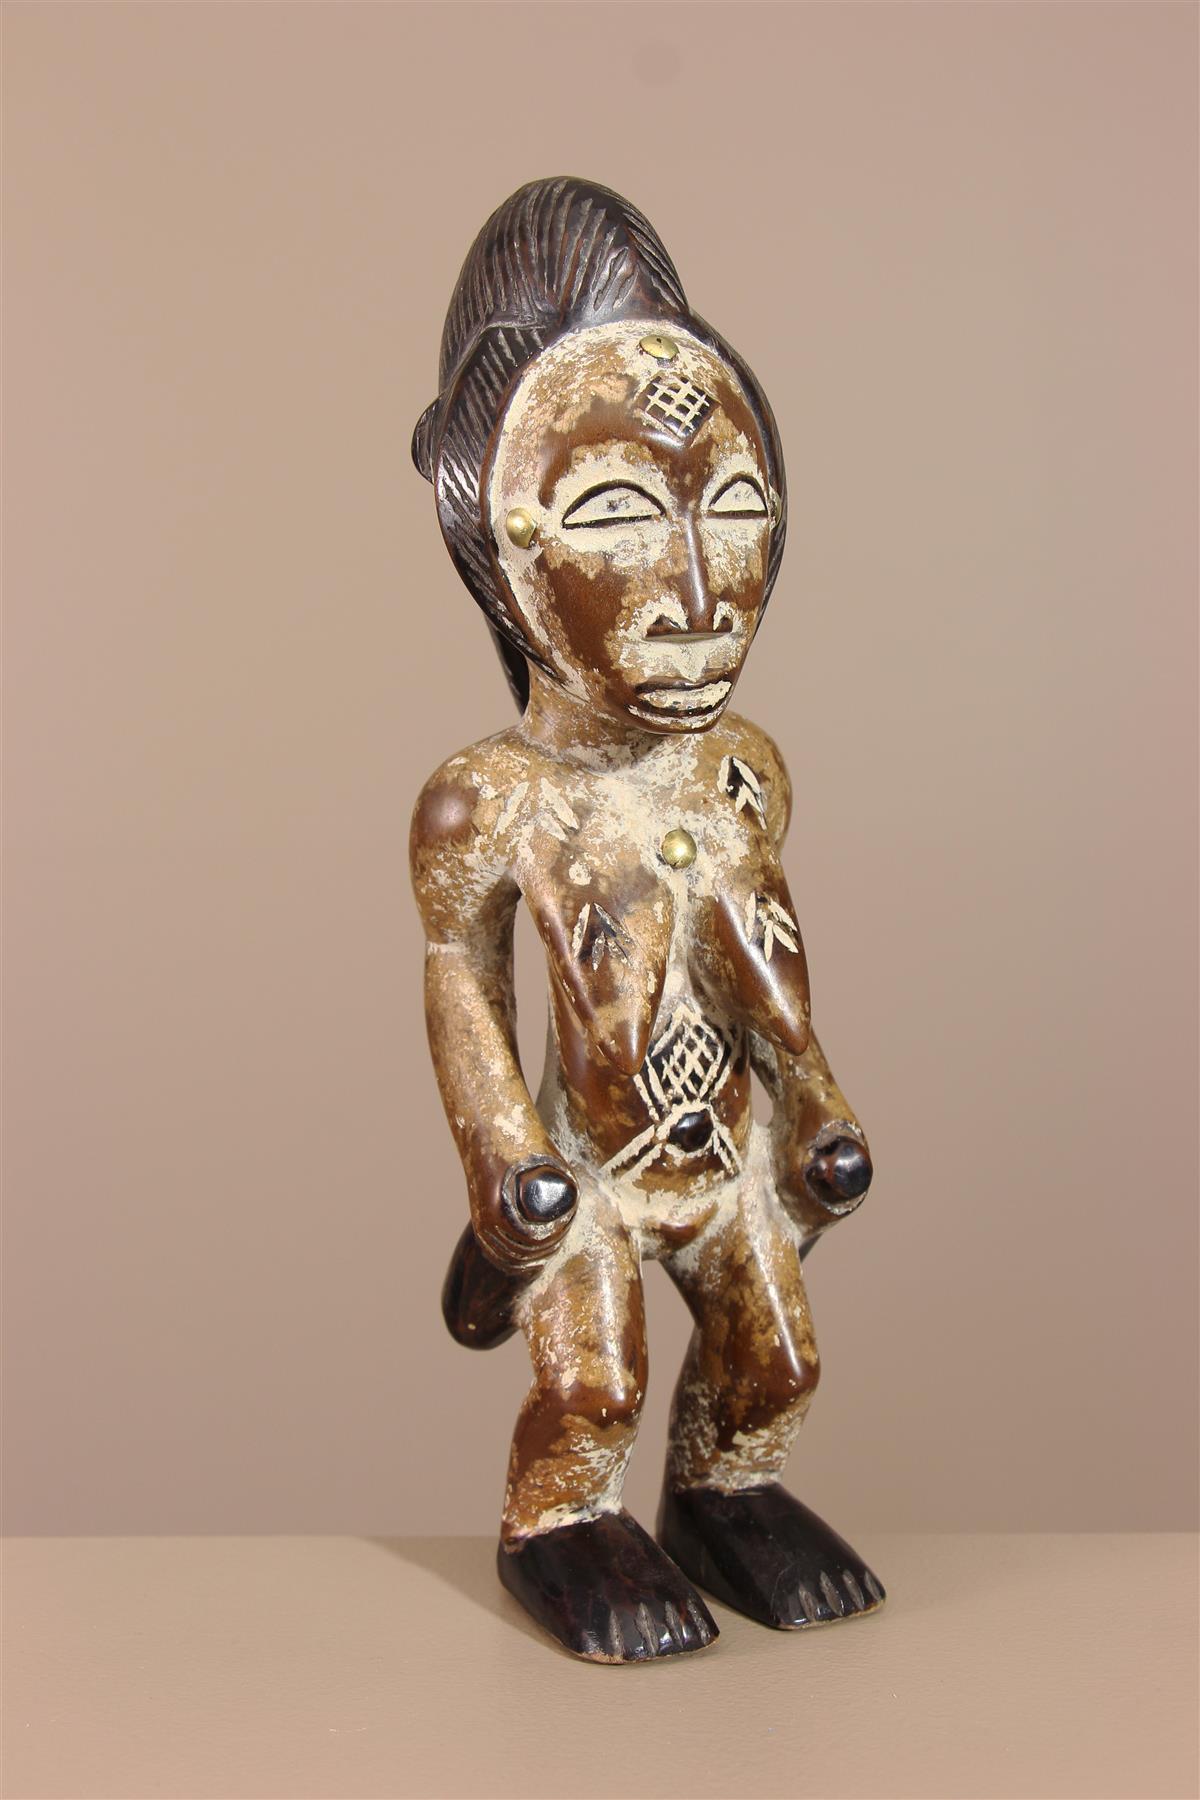 Statuette Punu - Déco africaine - Art africain traditionnel